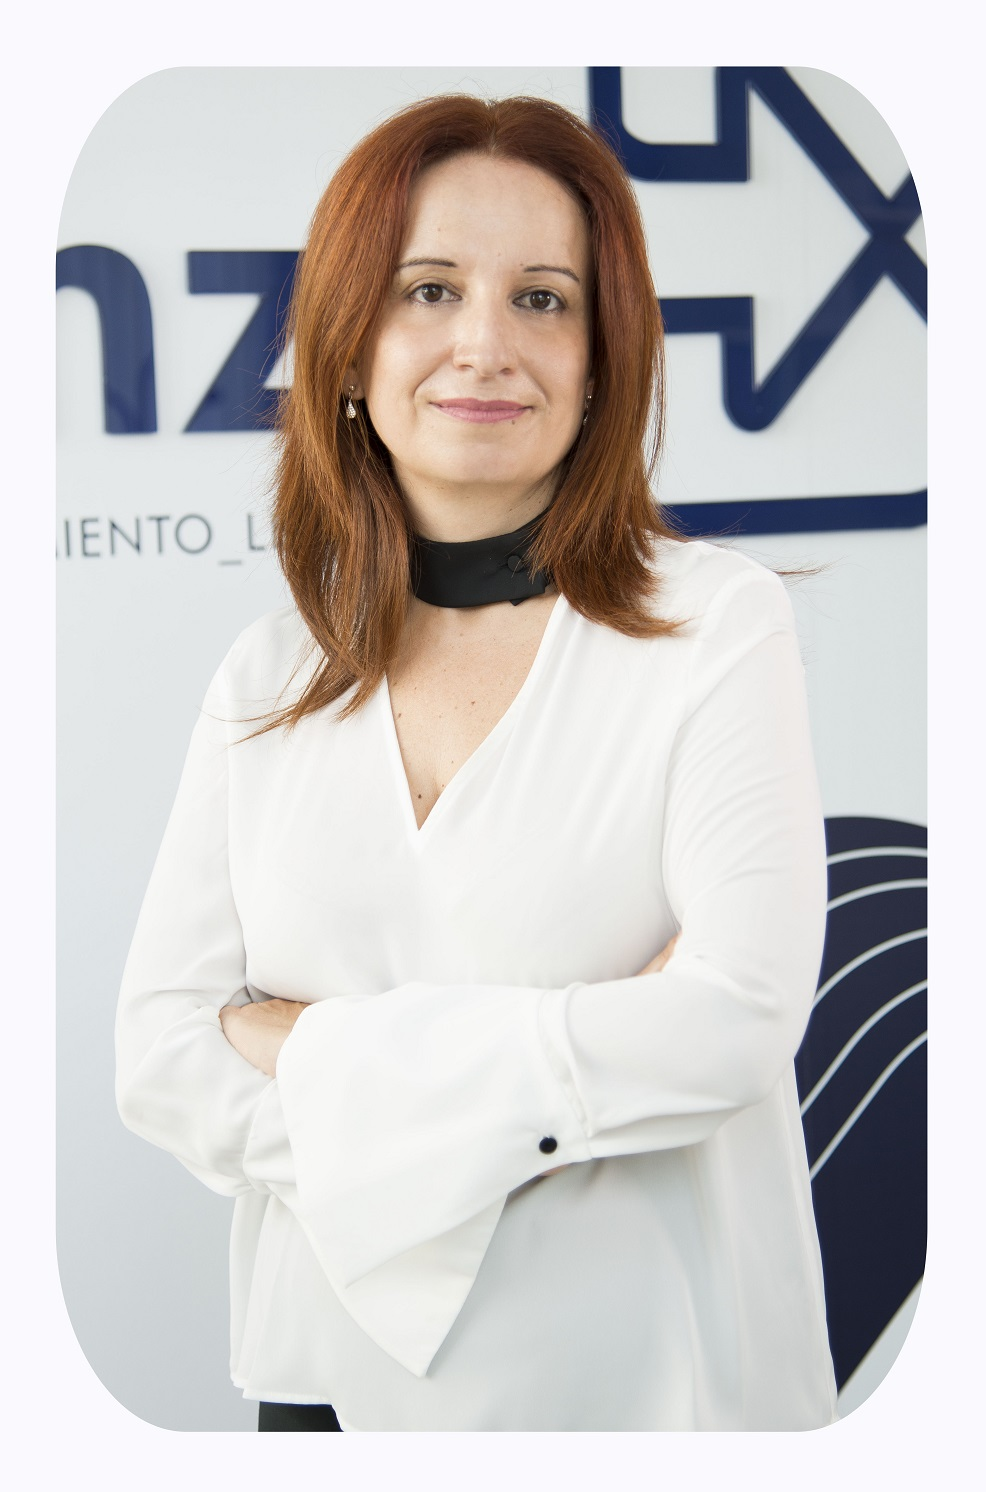 PATRICIA CORREA DOMINGUEZ